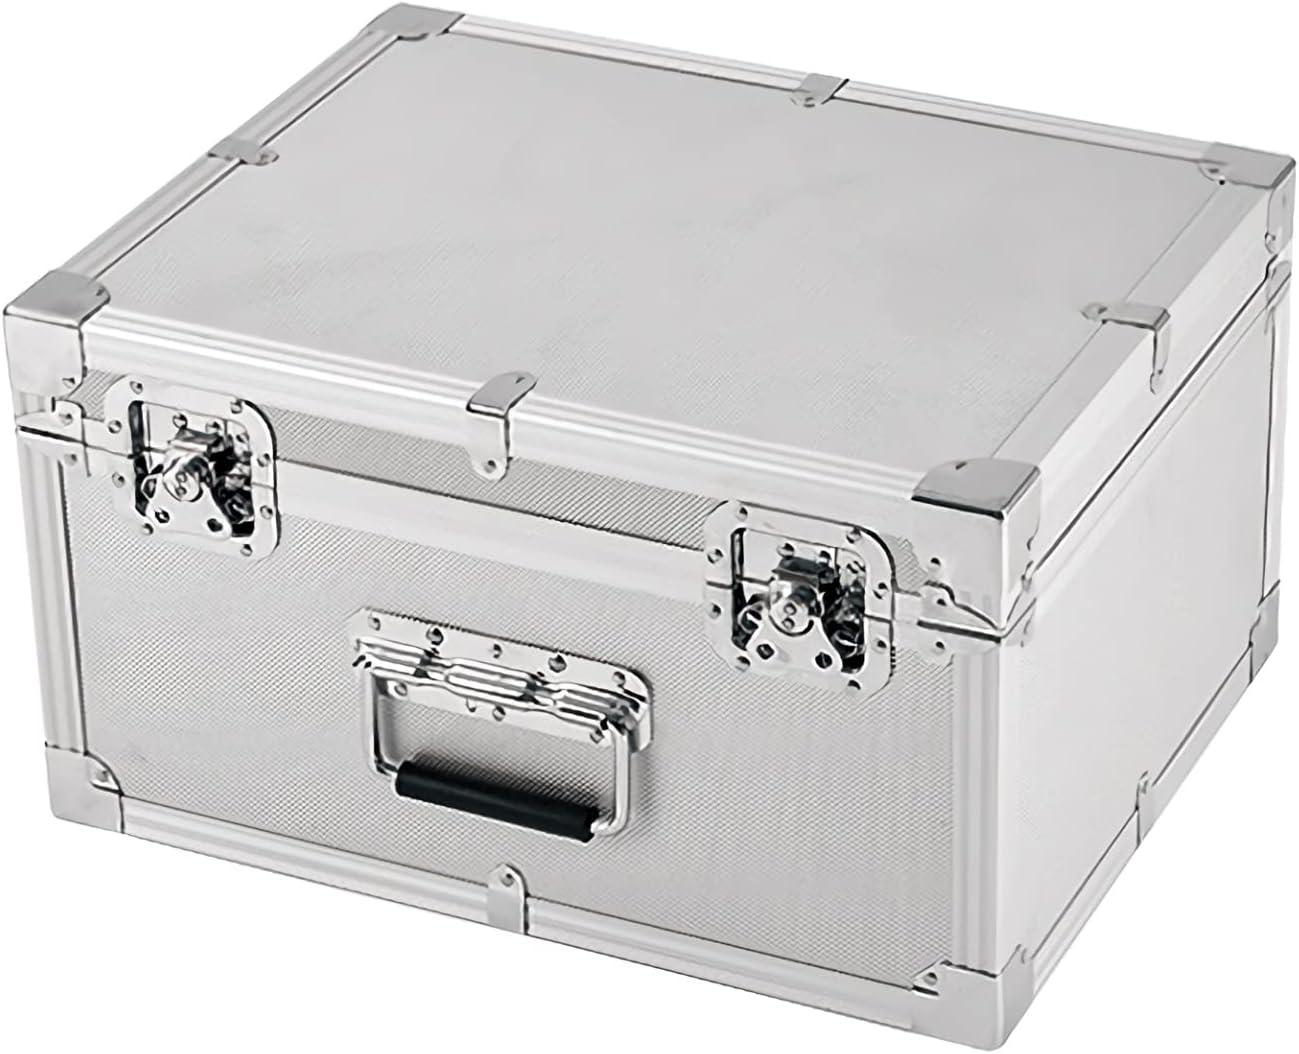 DAGCOT Aluminum Hard Tool Box Classic Briefcase Portable Storage Over item handling ☆ Toolbox